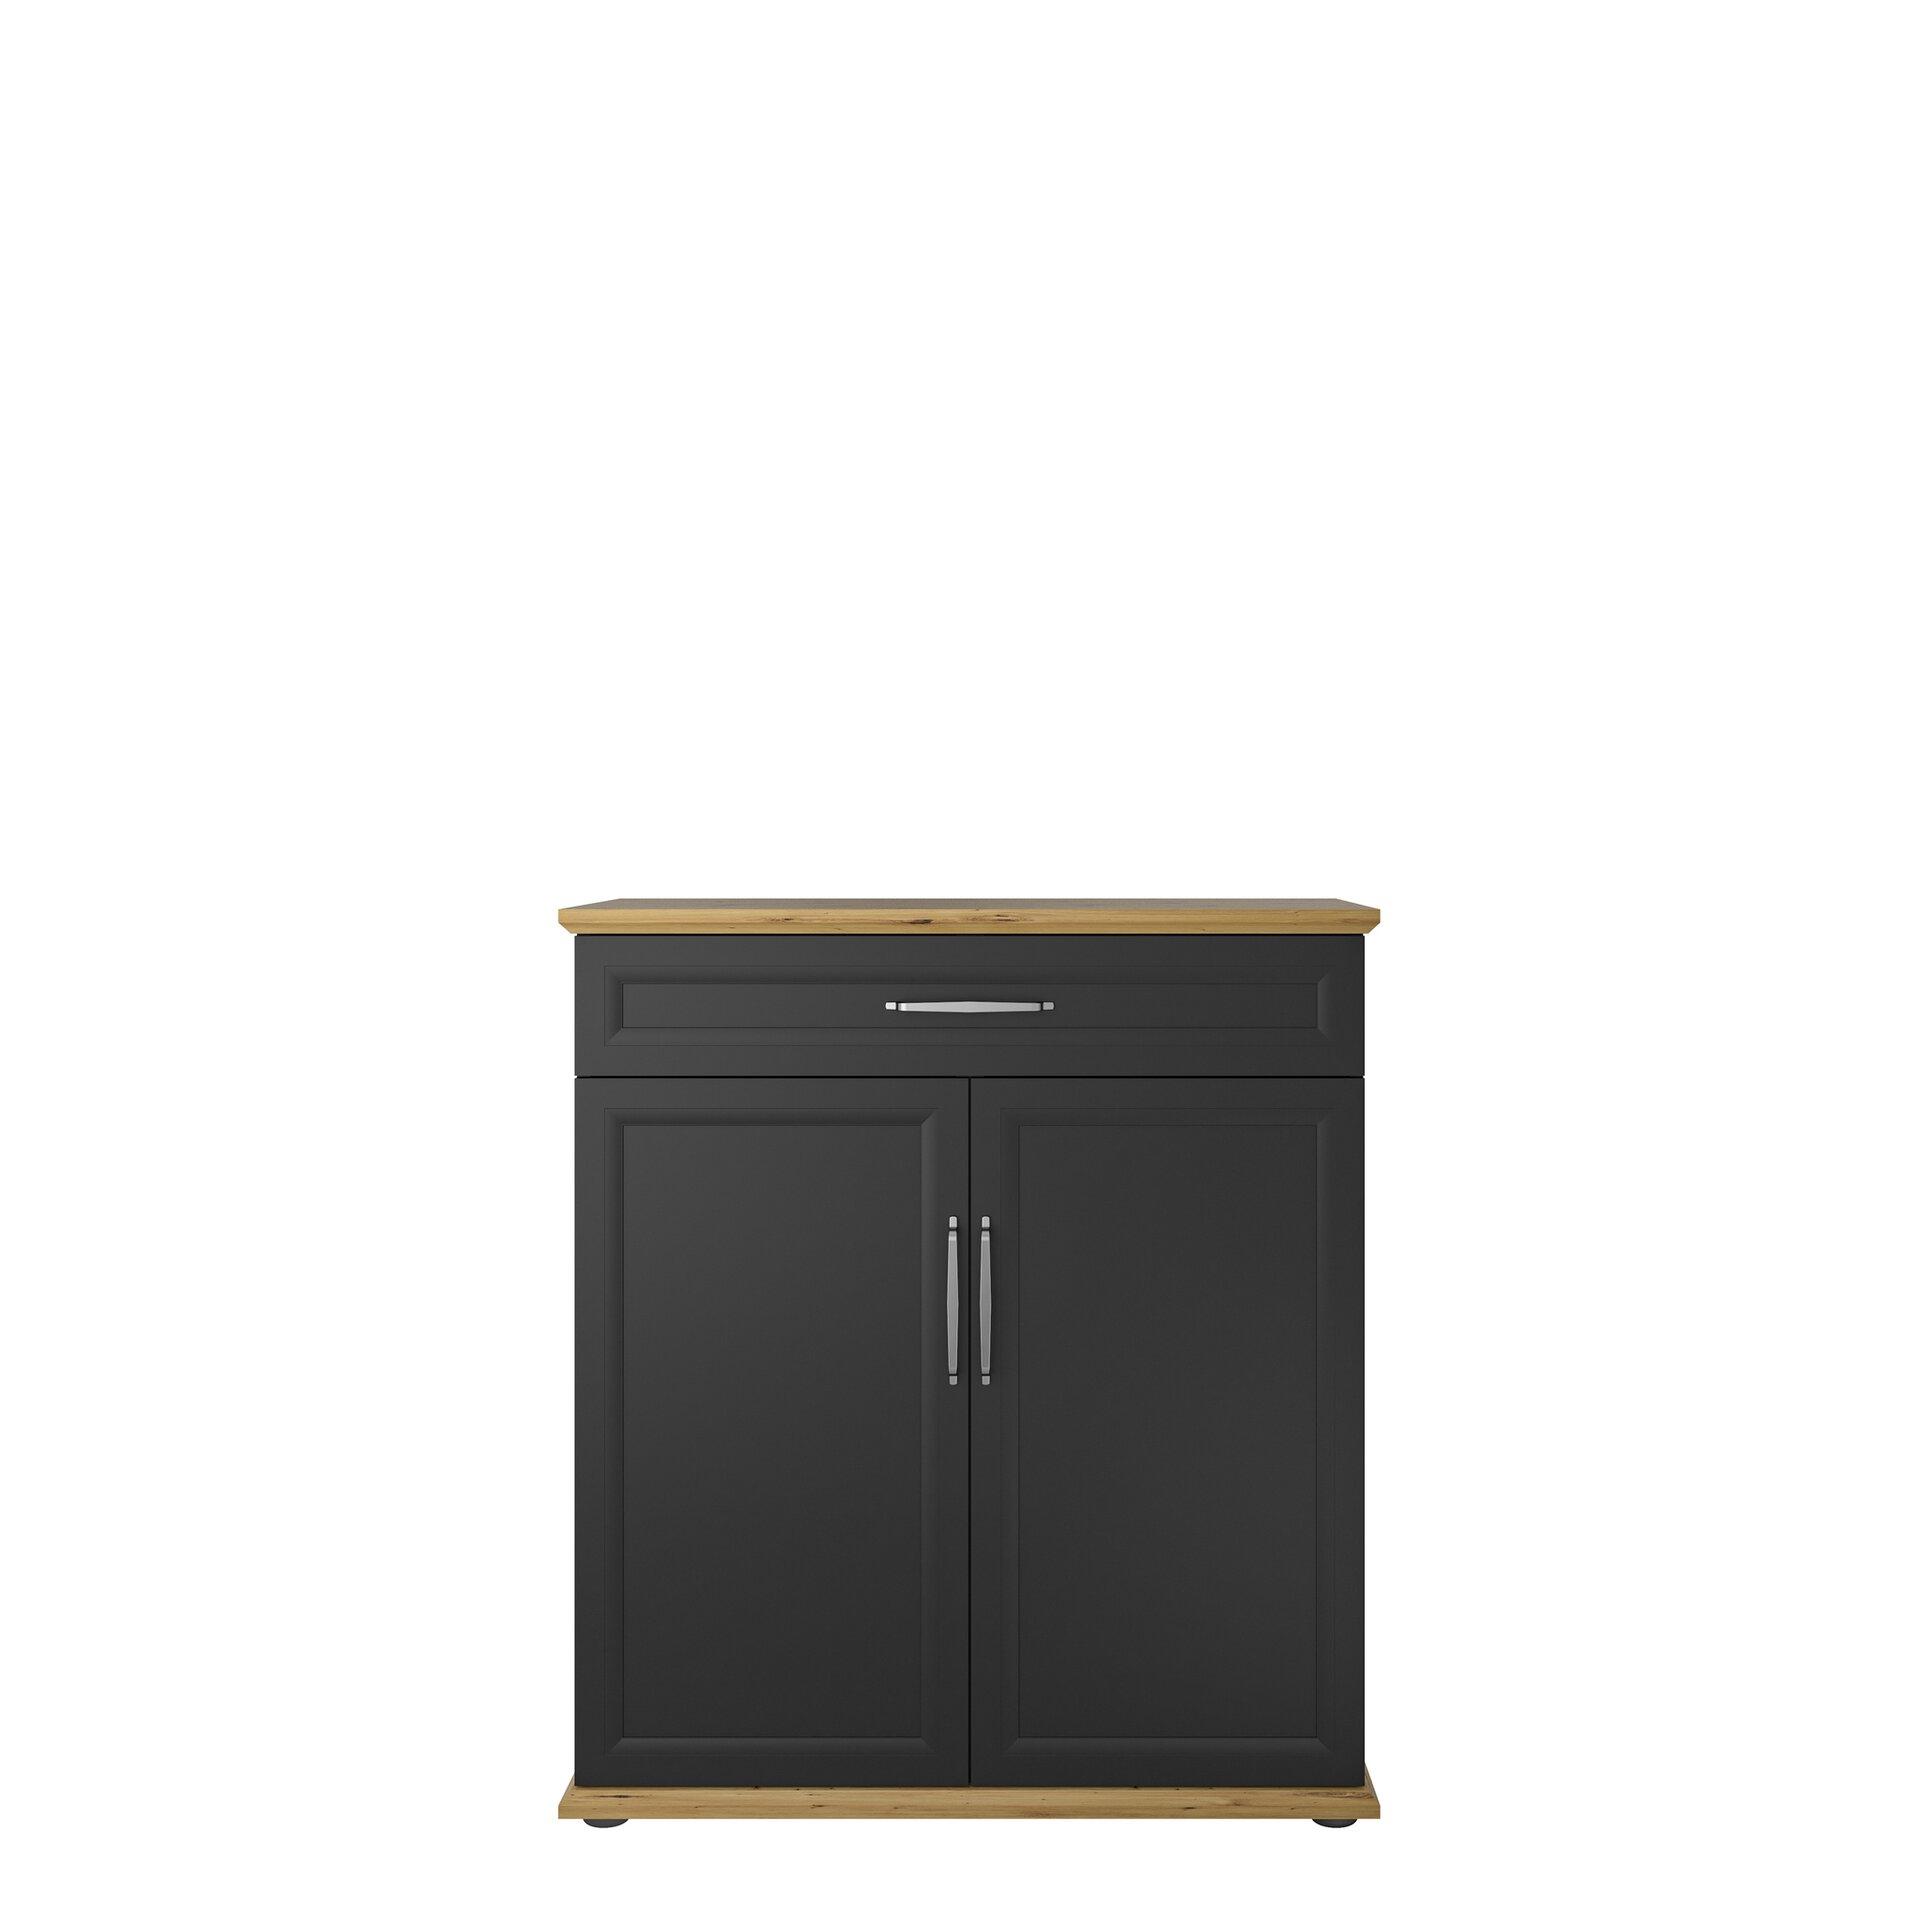 Aktenschrank KOBUS Vito Holzwerkstoff grau 70 x 77 x 150 cm